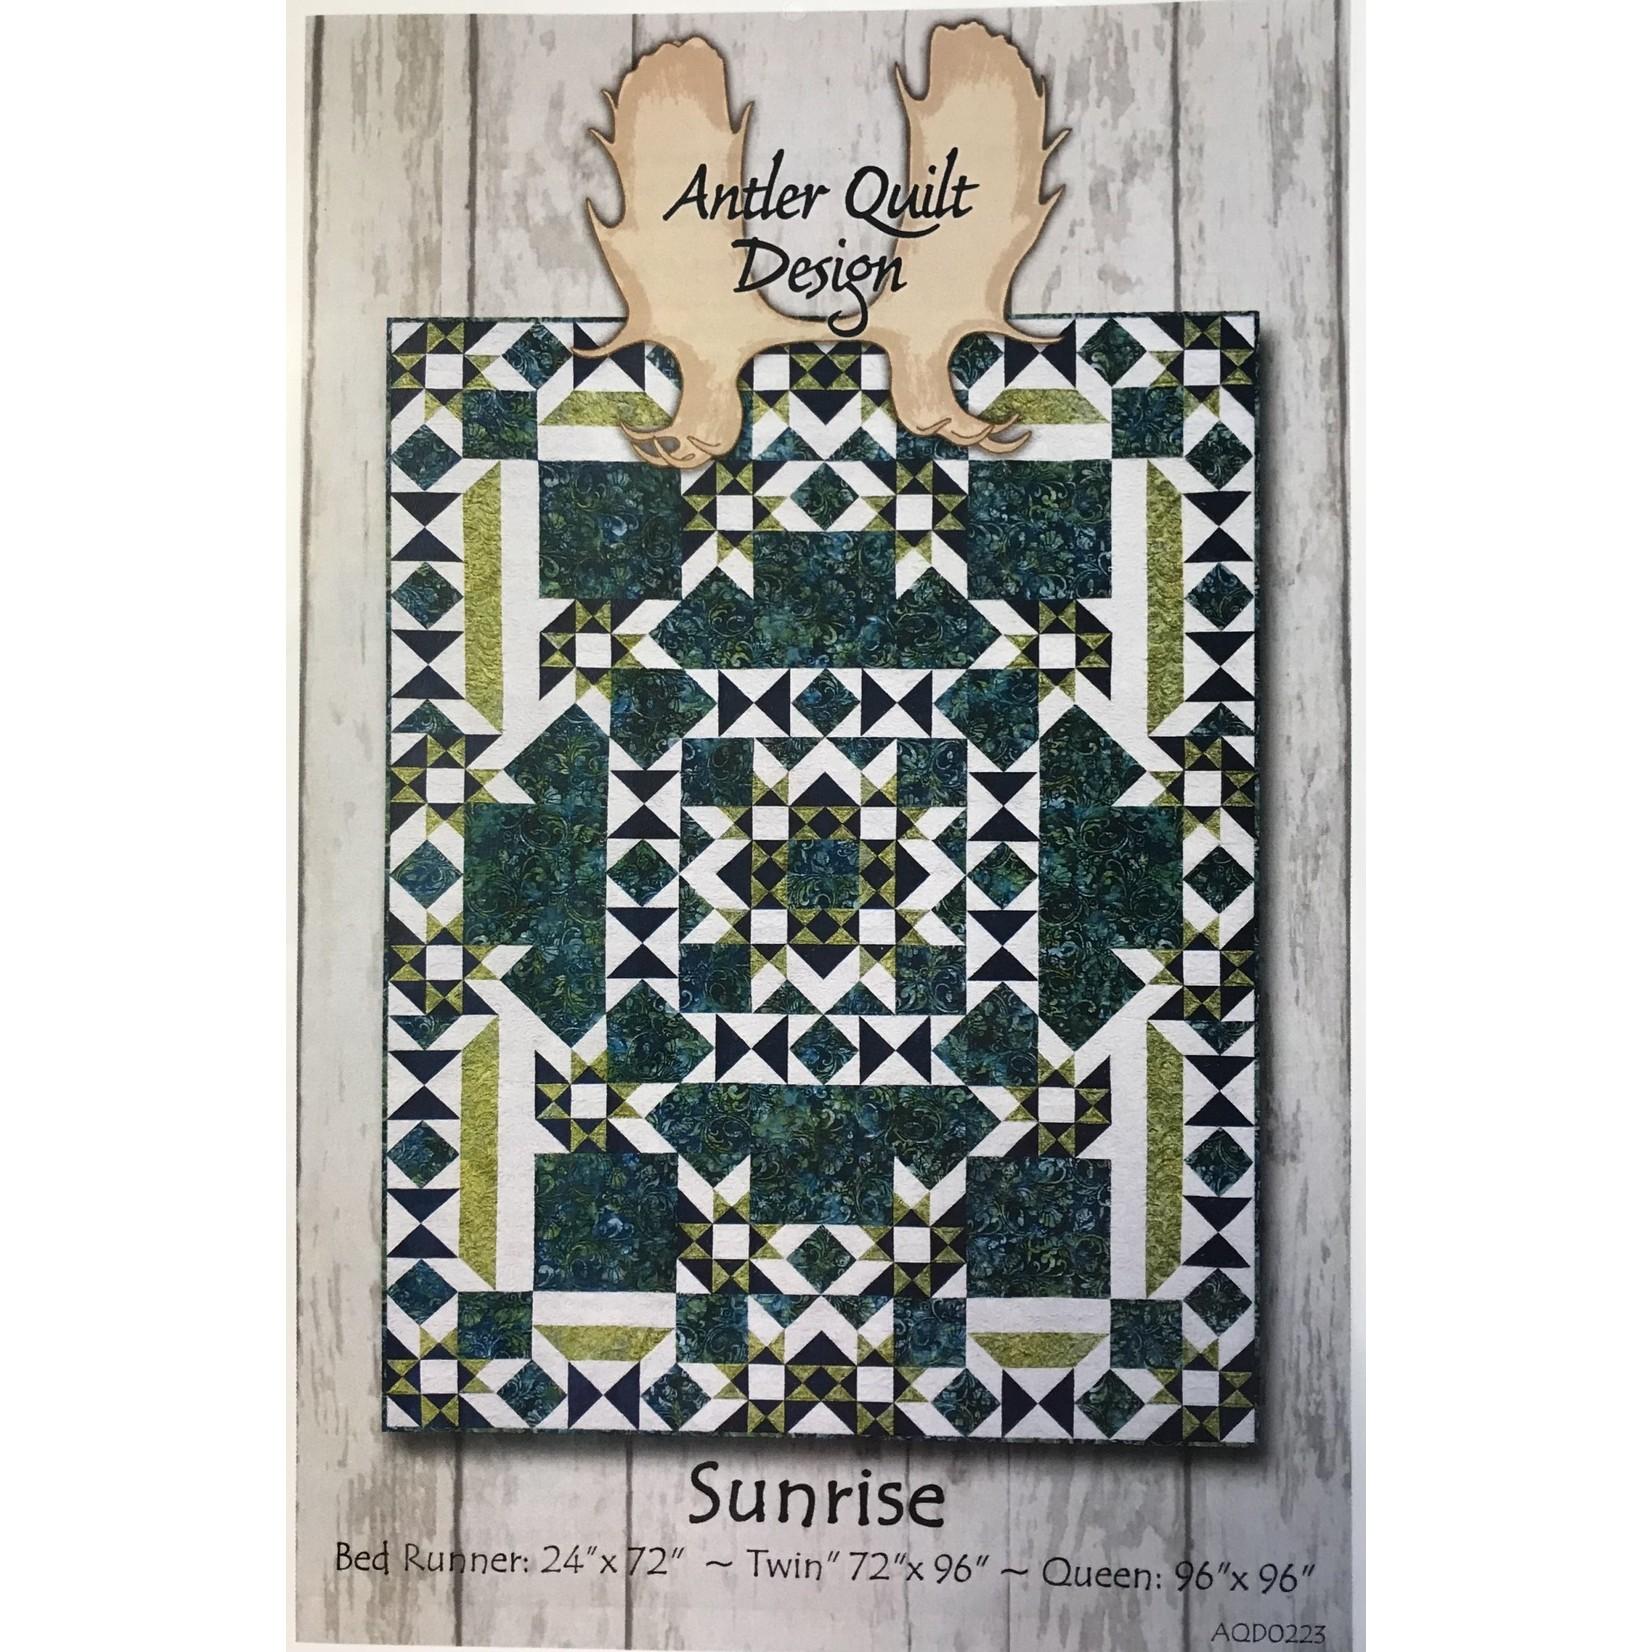 Antler Quilt Design SUNRISE PATTERN